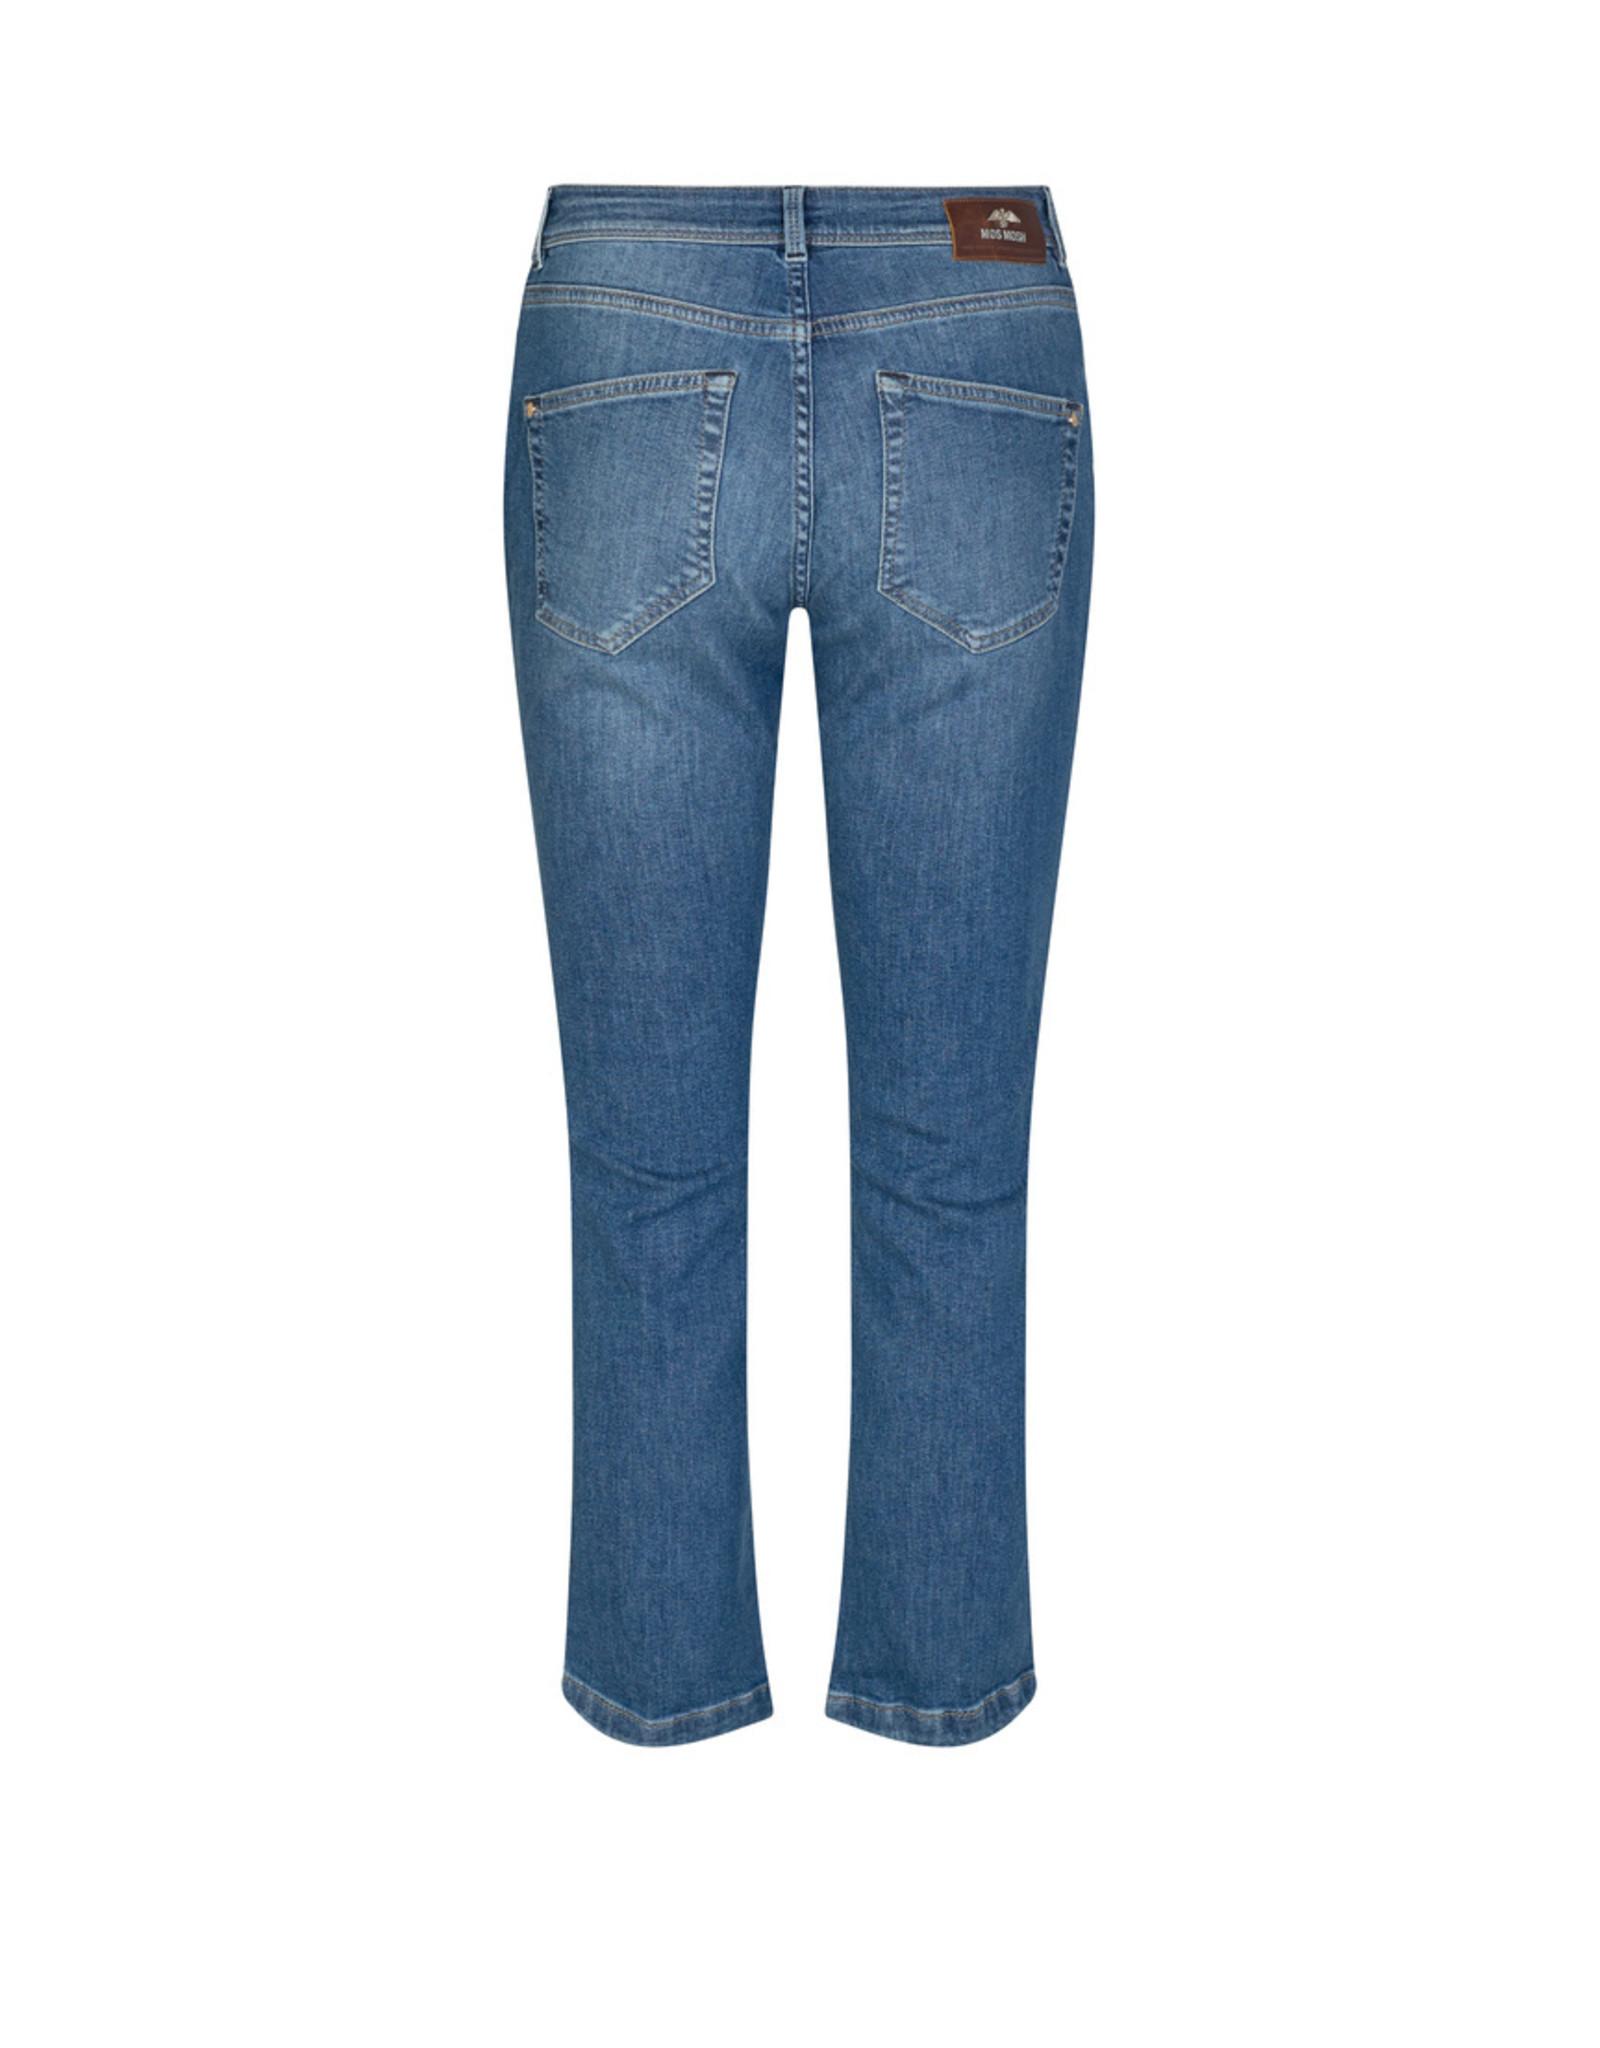 Mos Mosh Serena Epic Jeans